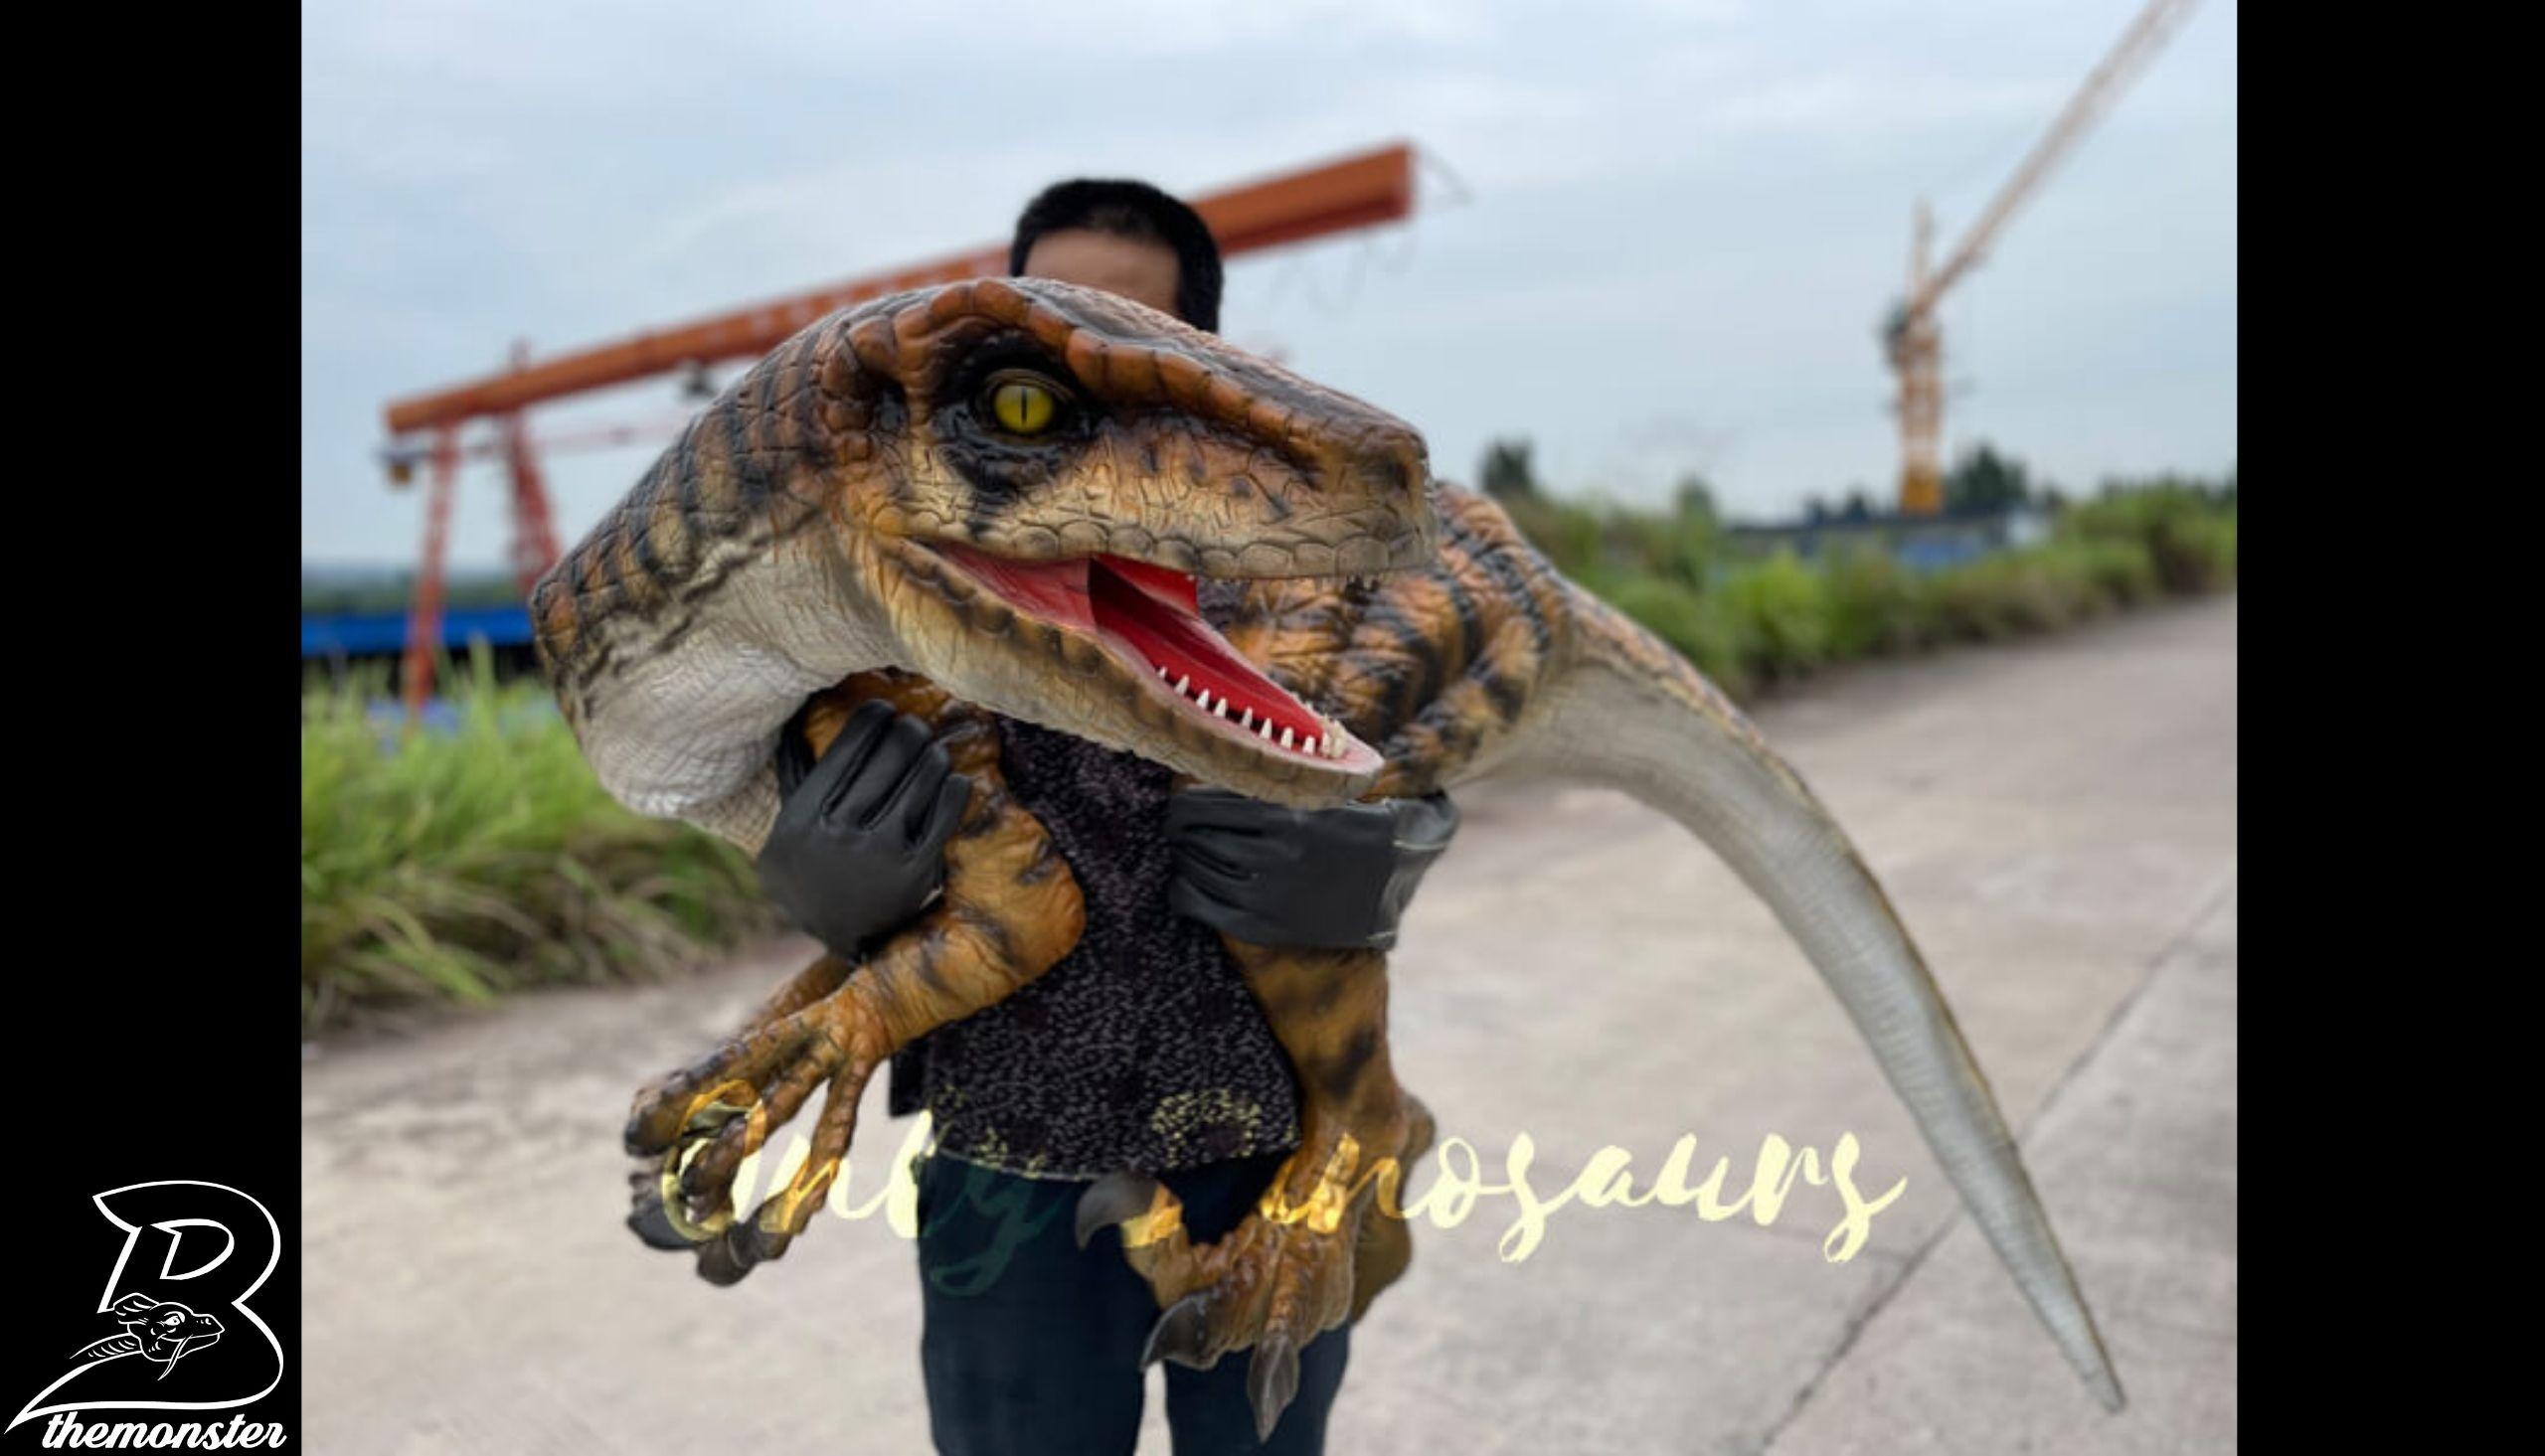 Realistic False Arm Raptor Shoulder Puppet in vendita sul Bthemonster.com